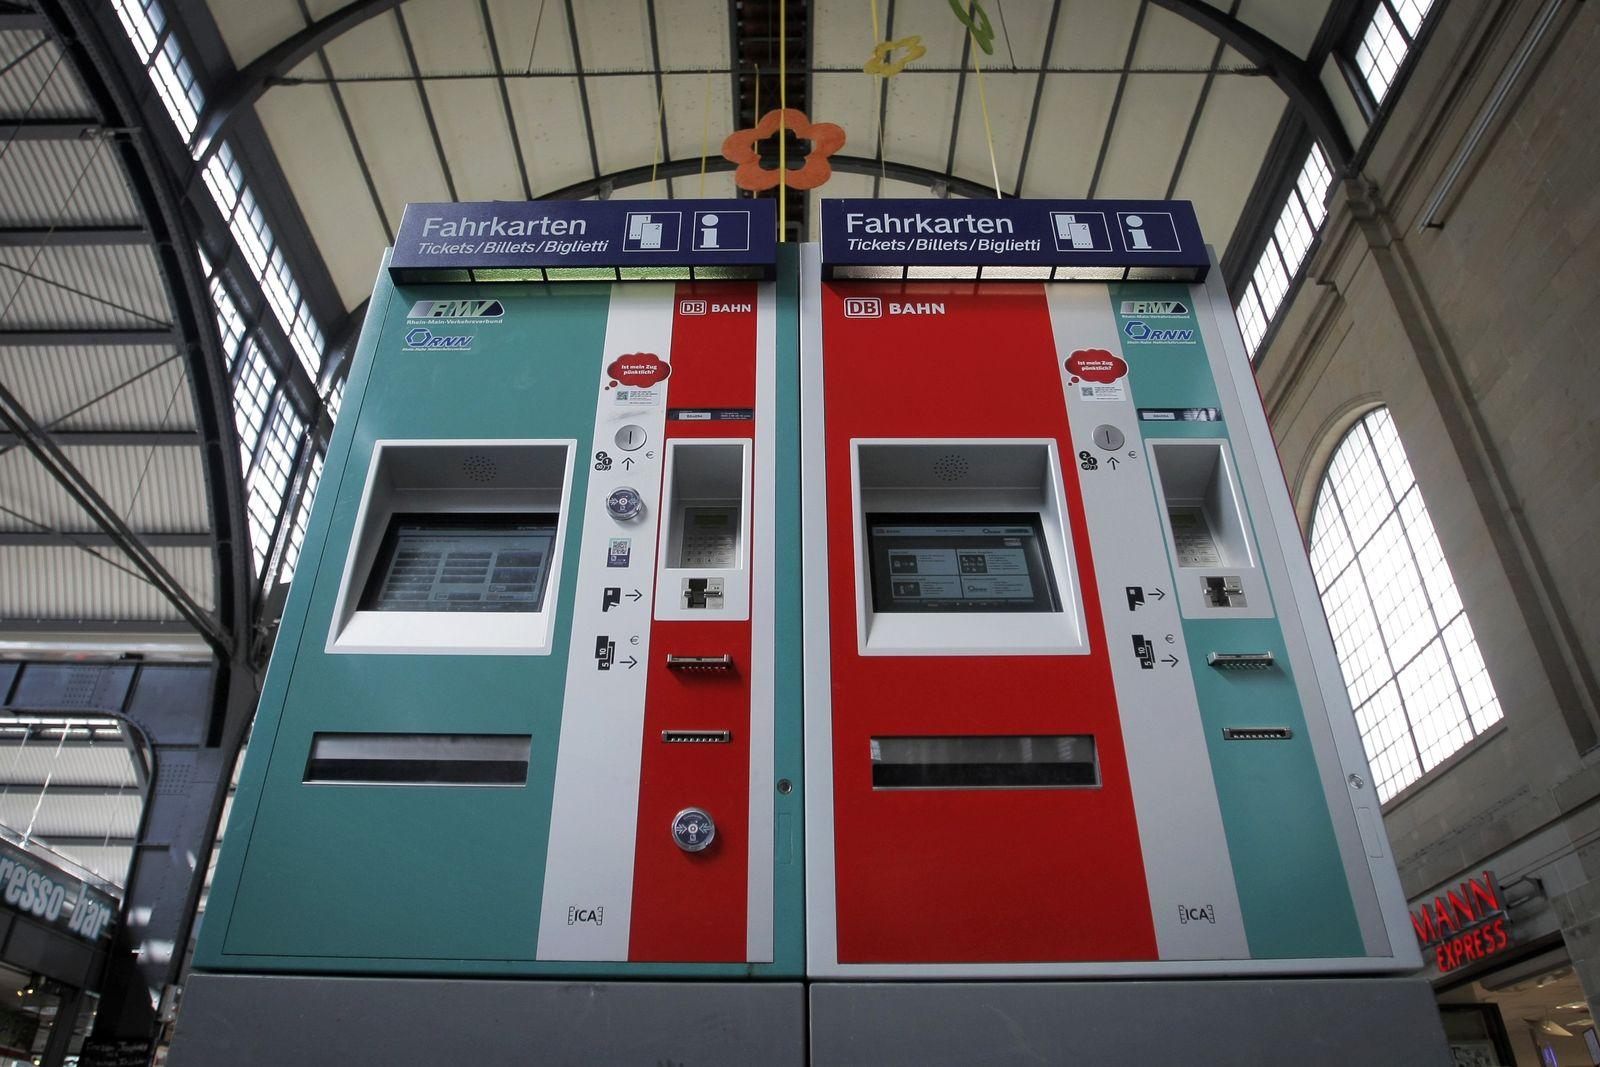 LKA warnt vor manipulierten Bahnfahrkartenautomaten